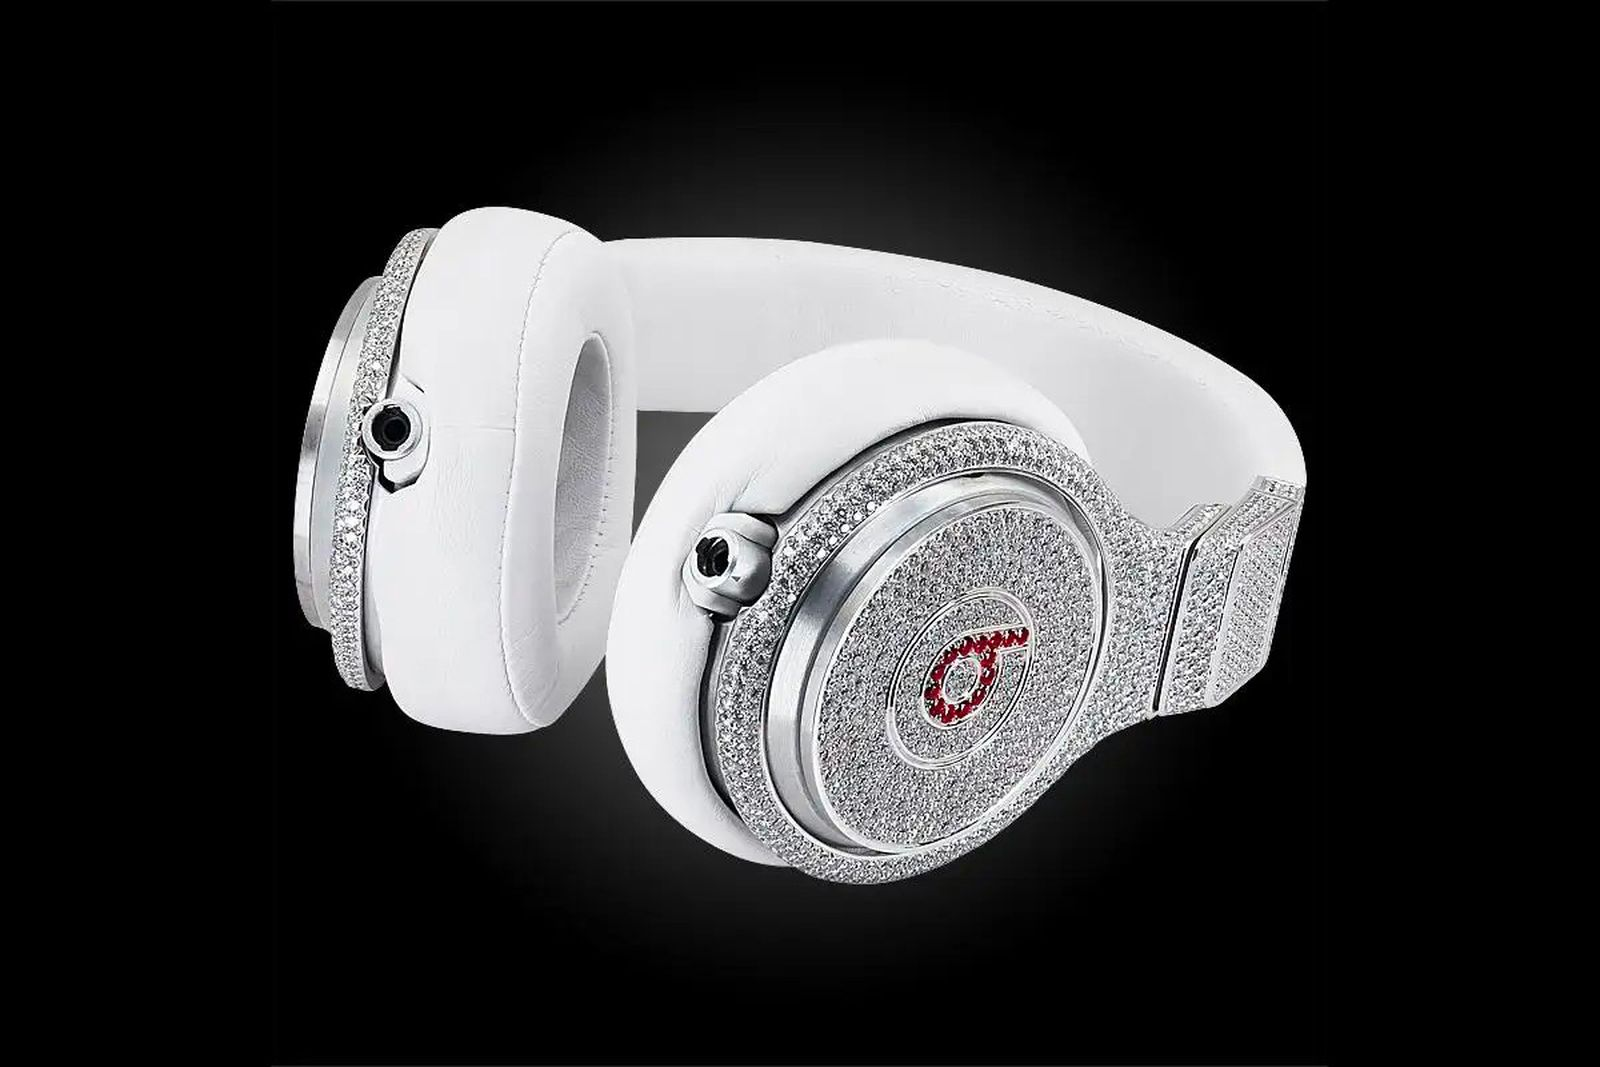 Diamond and Ruby Beats Pro Headphones